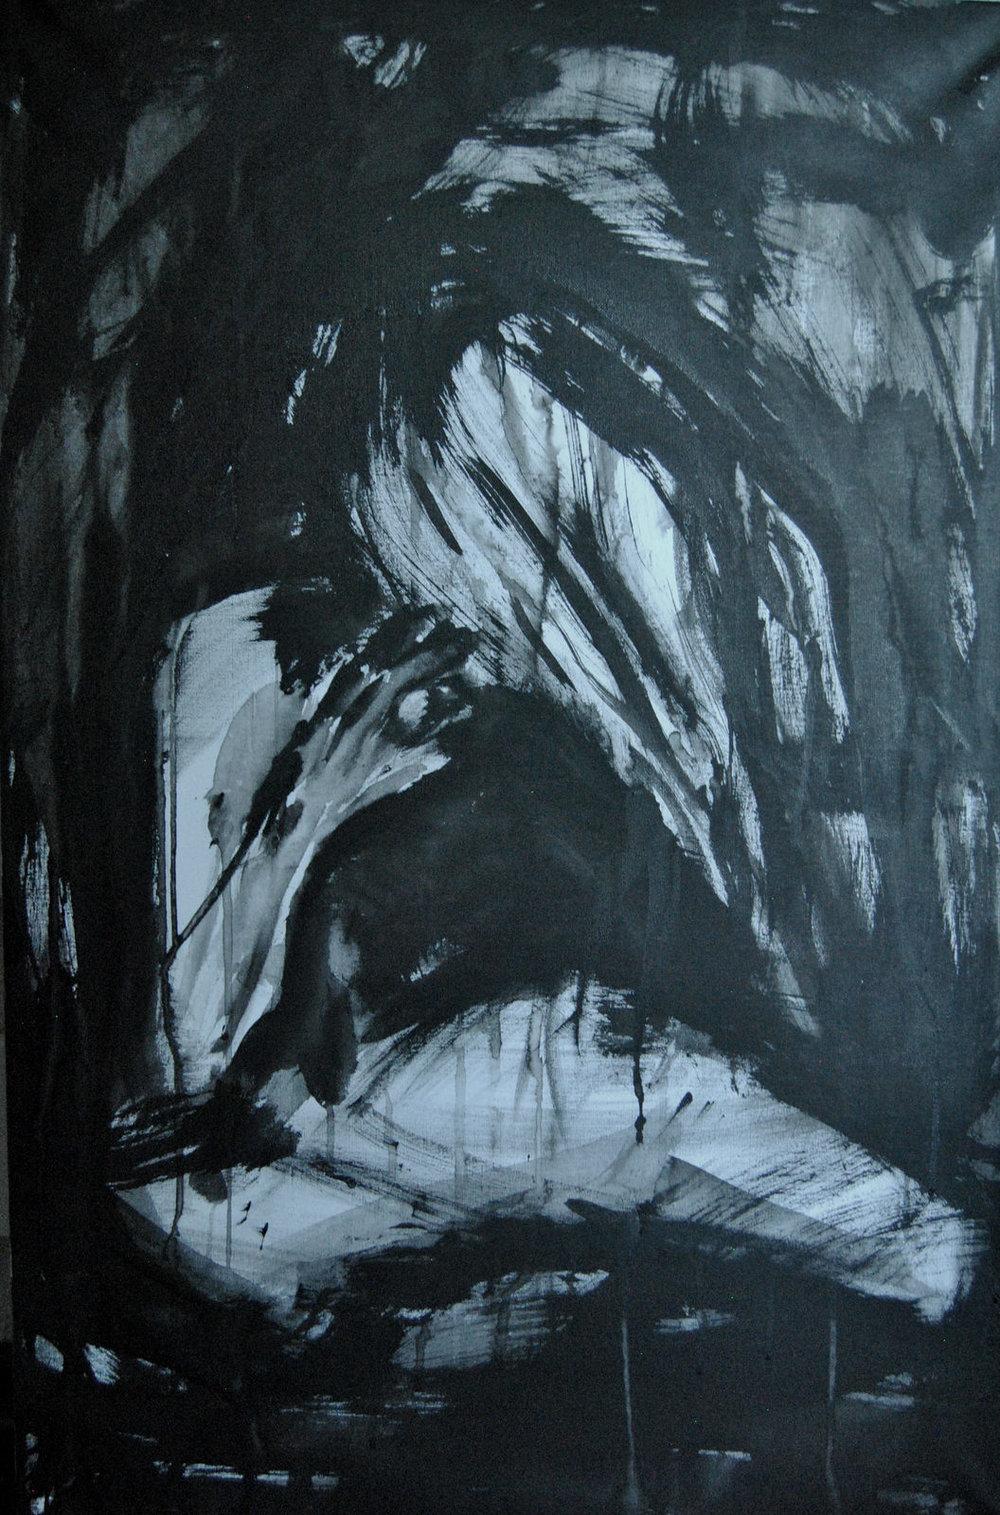 Figure, Acrylic on Canvas, 594 x 841 mm 17-11-15